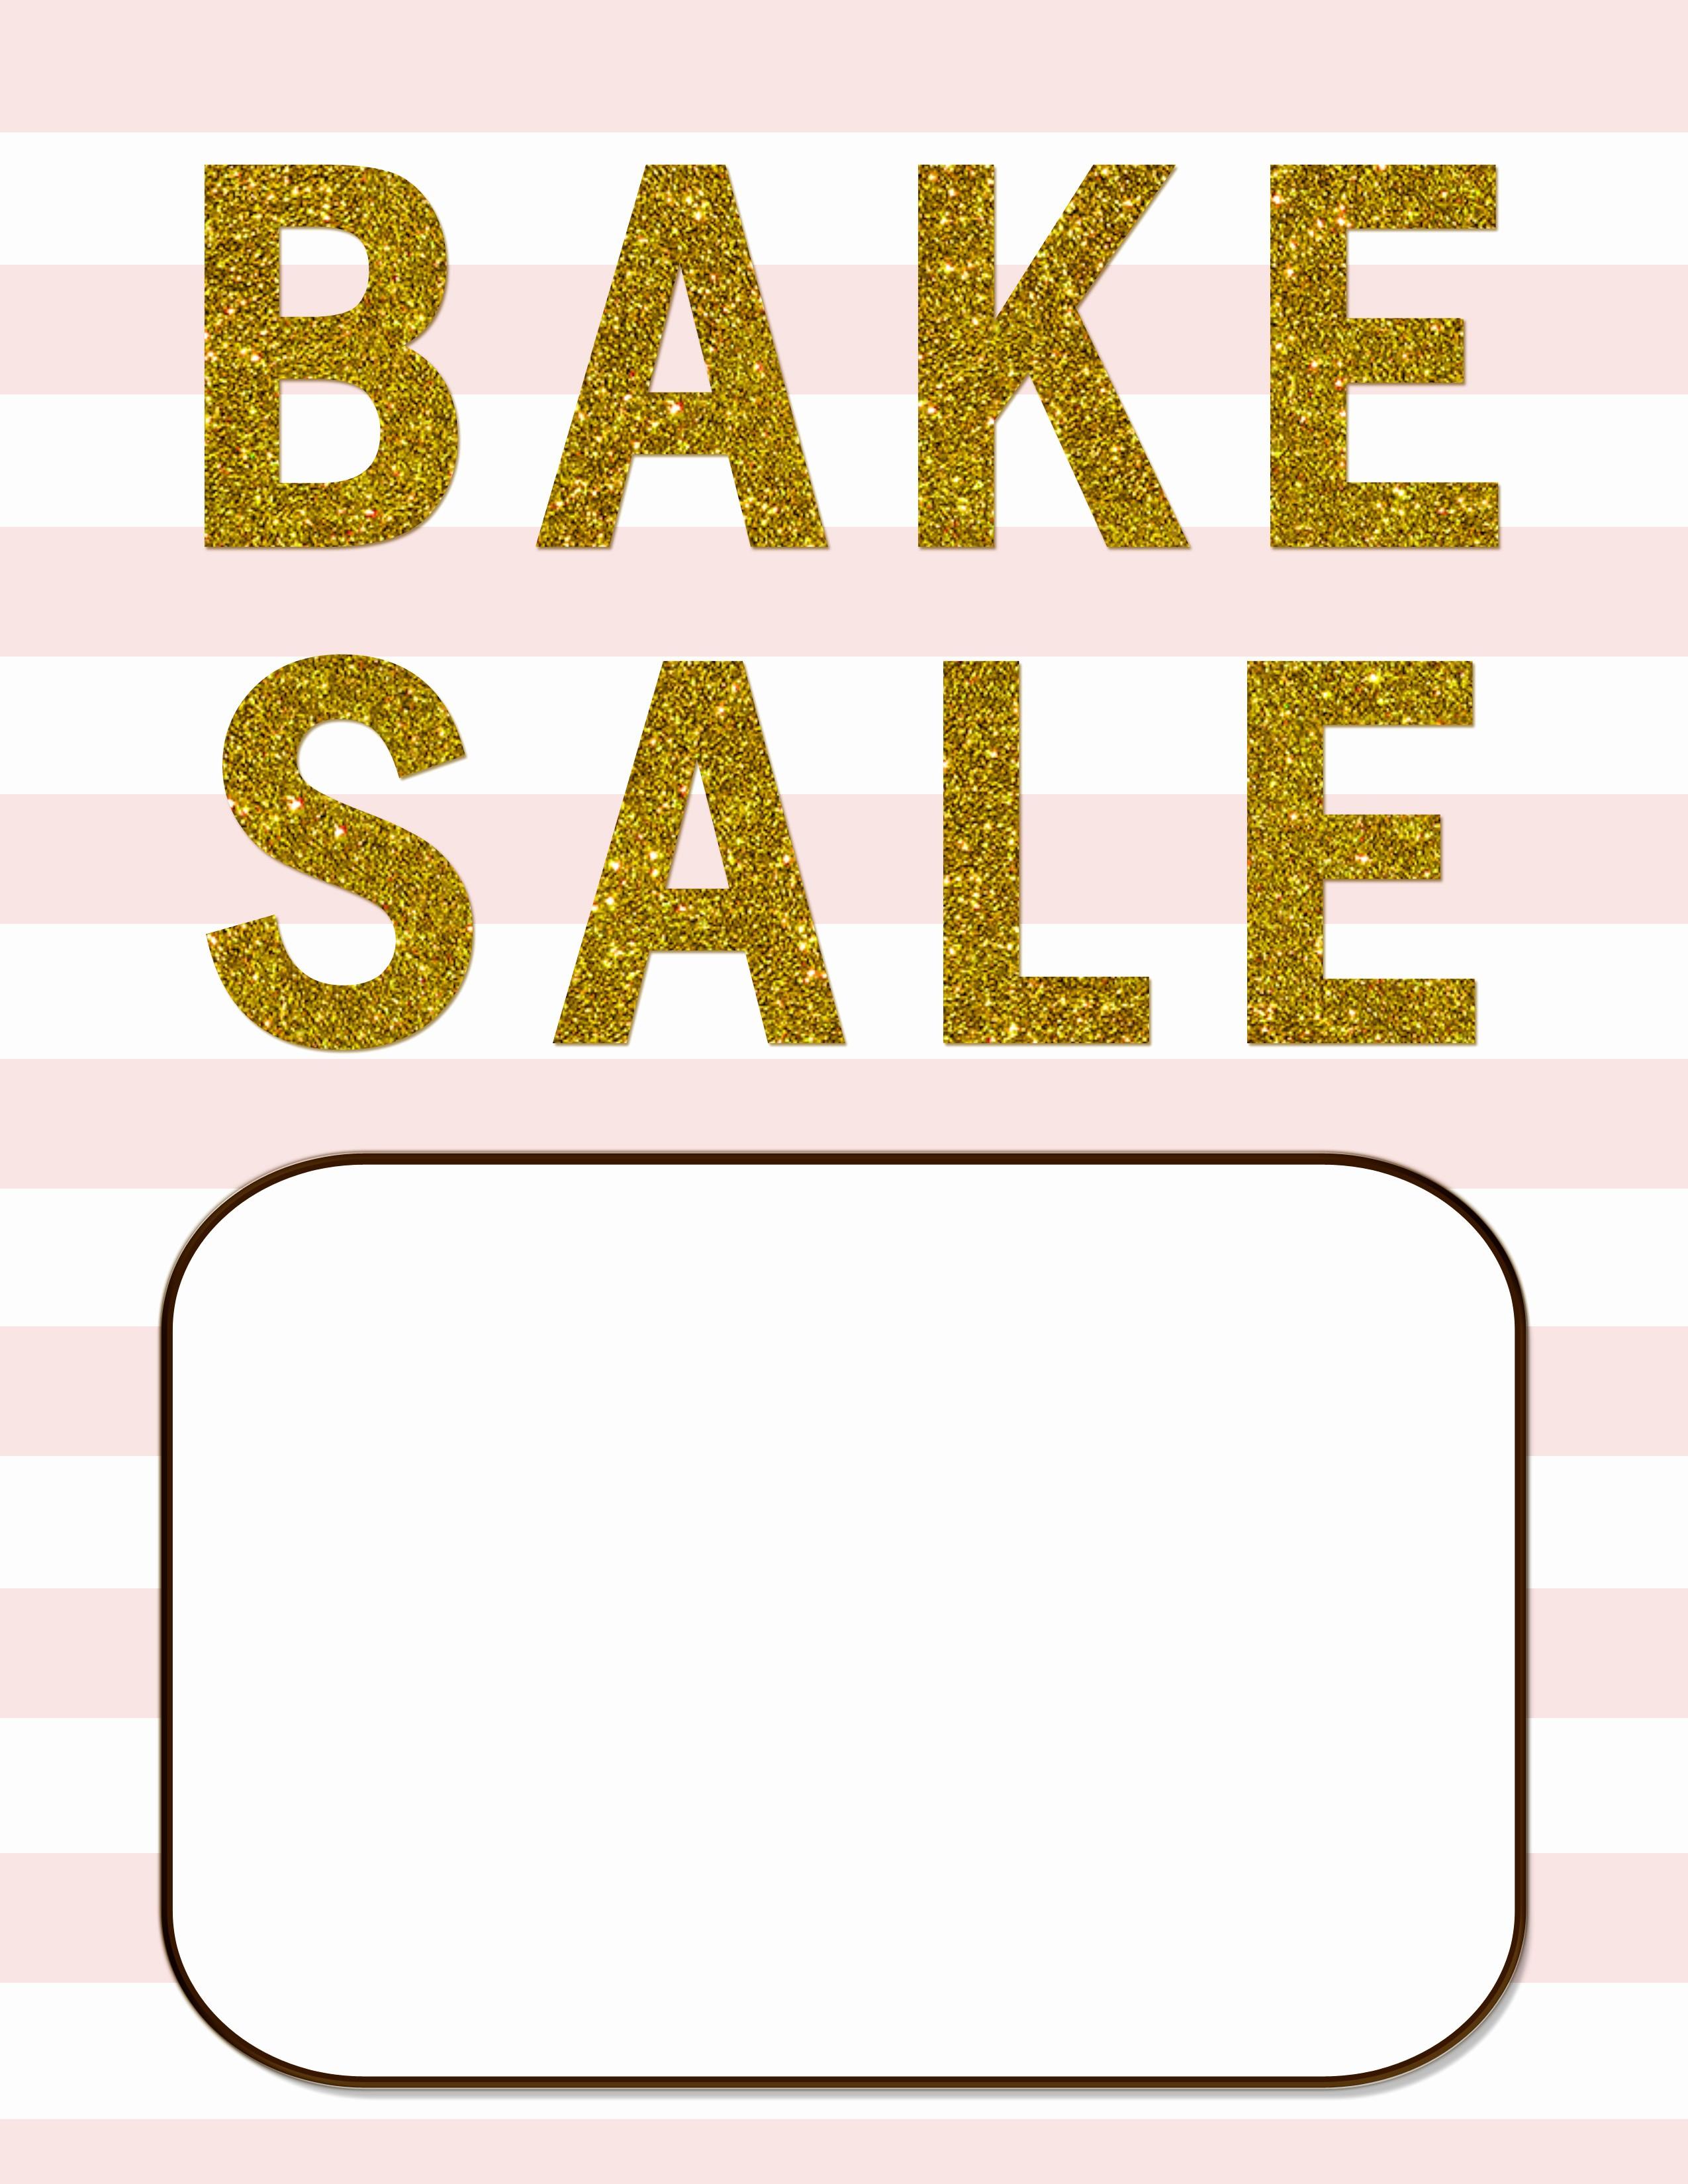 Bake Sale Flyer Template Word Elegant Bake Sale Flyers – Free Flyer Designs